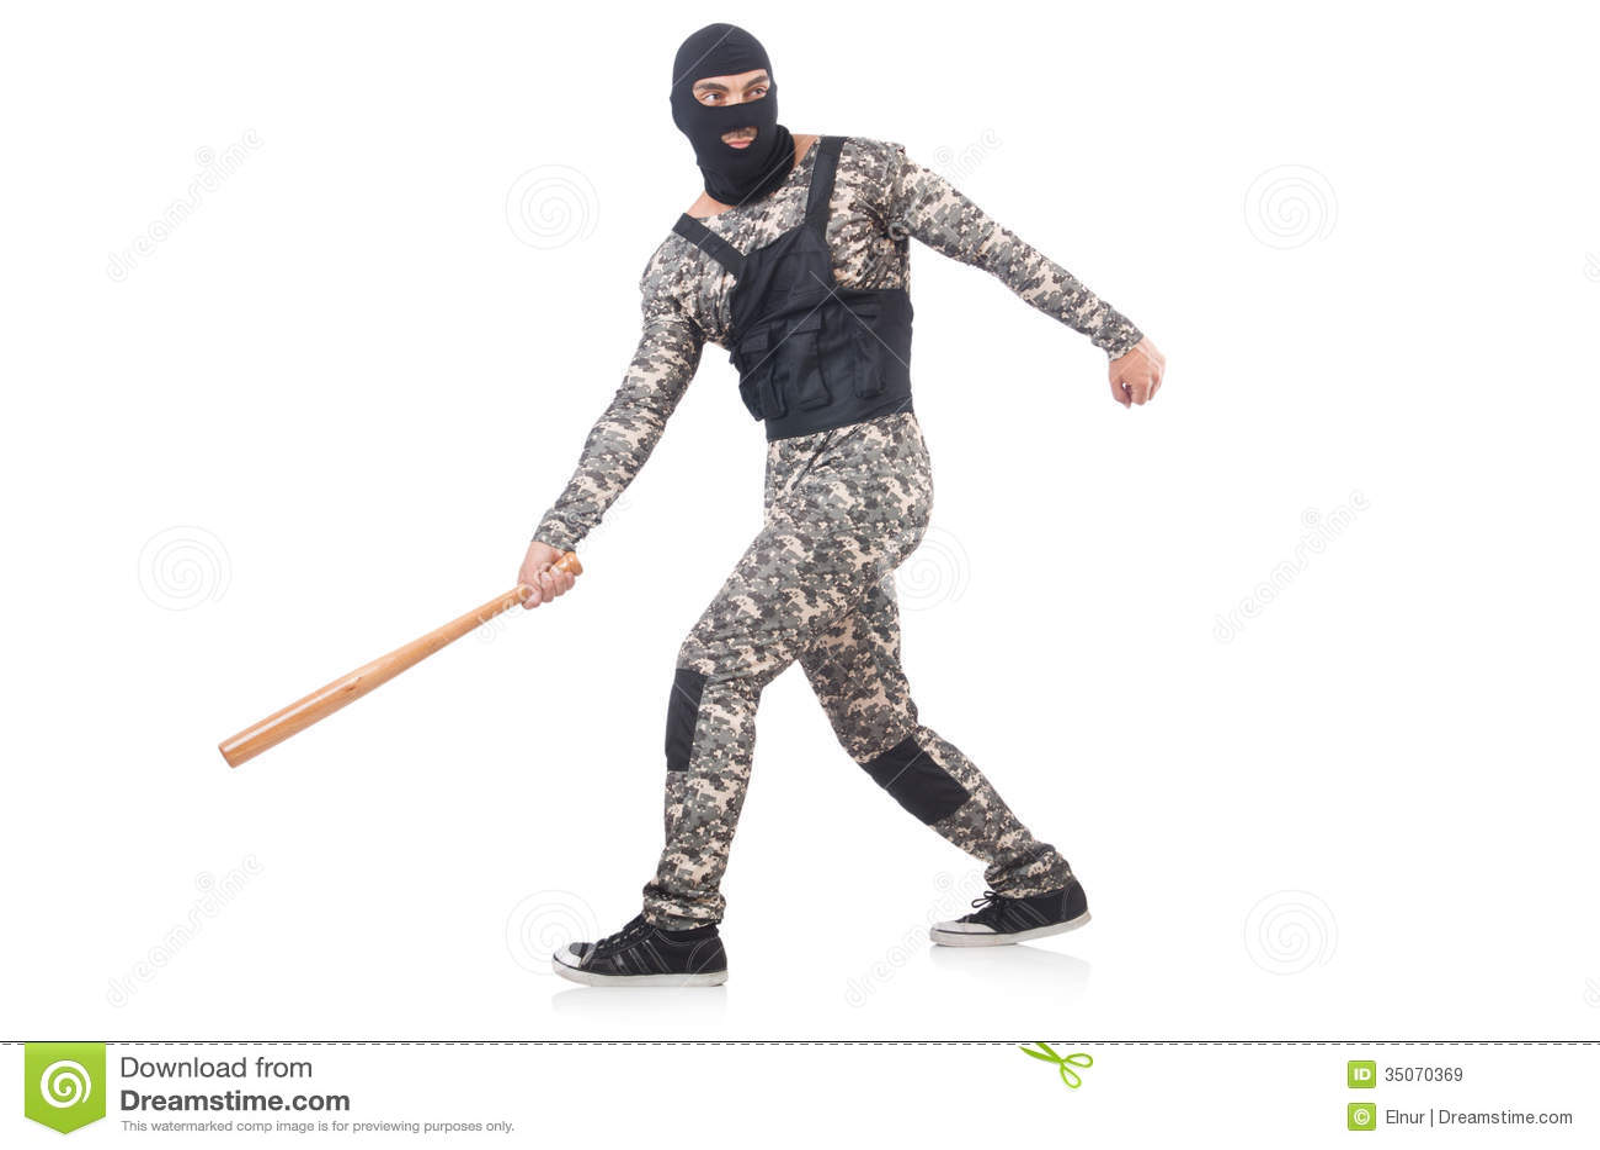 [Image: soldier-baseball-bat-isolated-white-35070369.jpg]